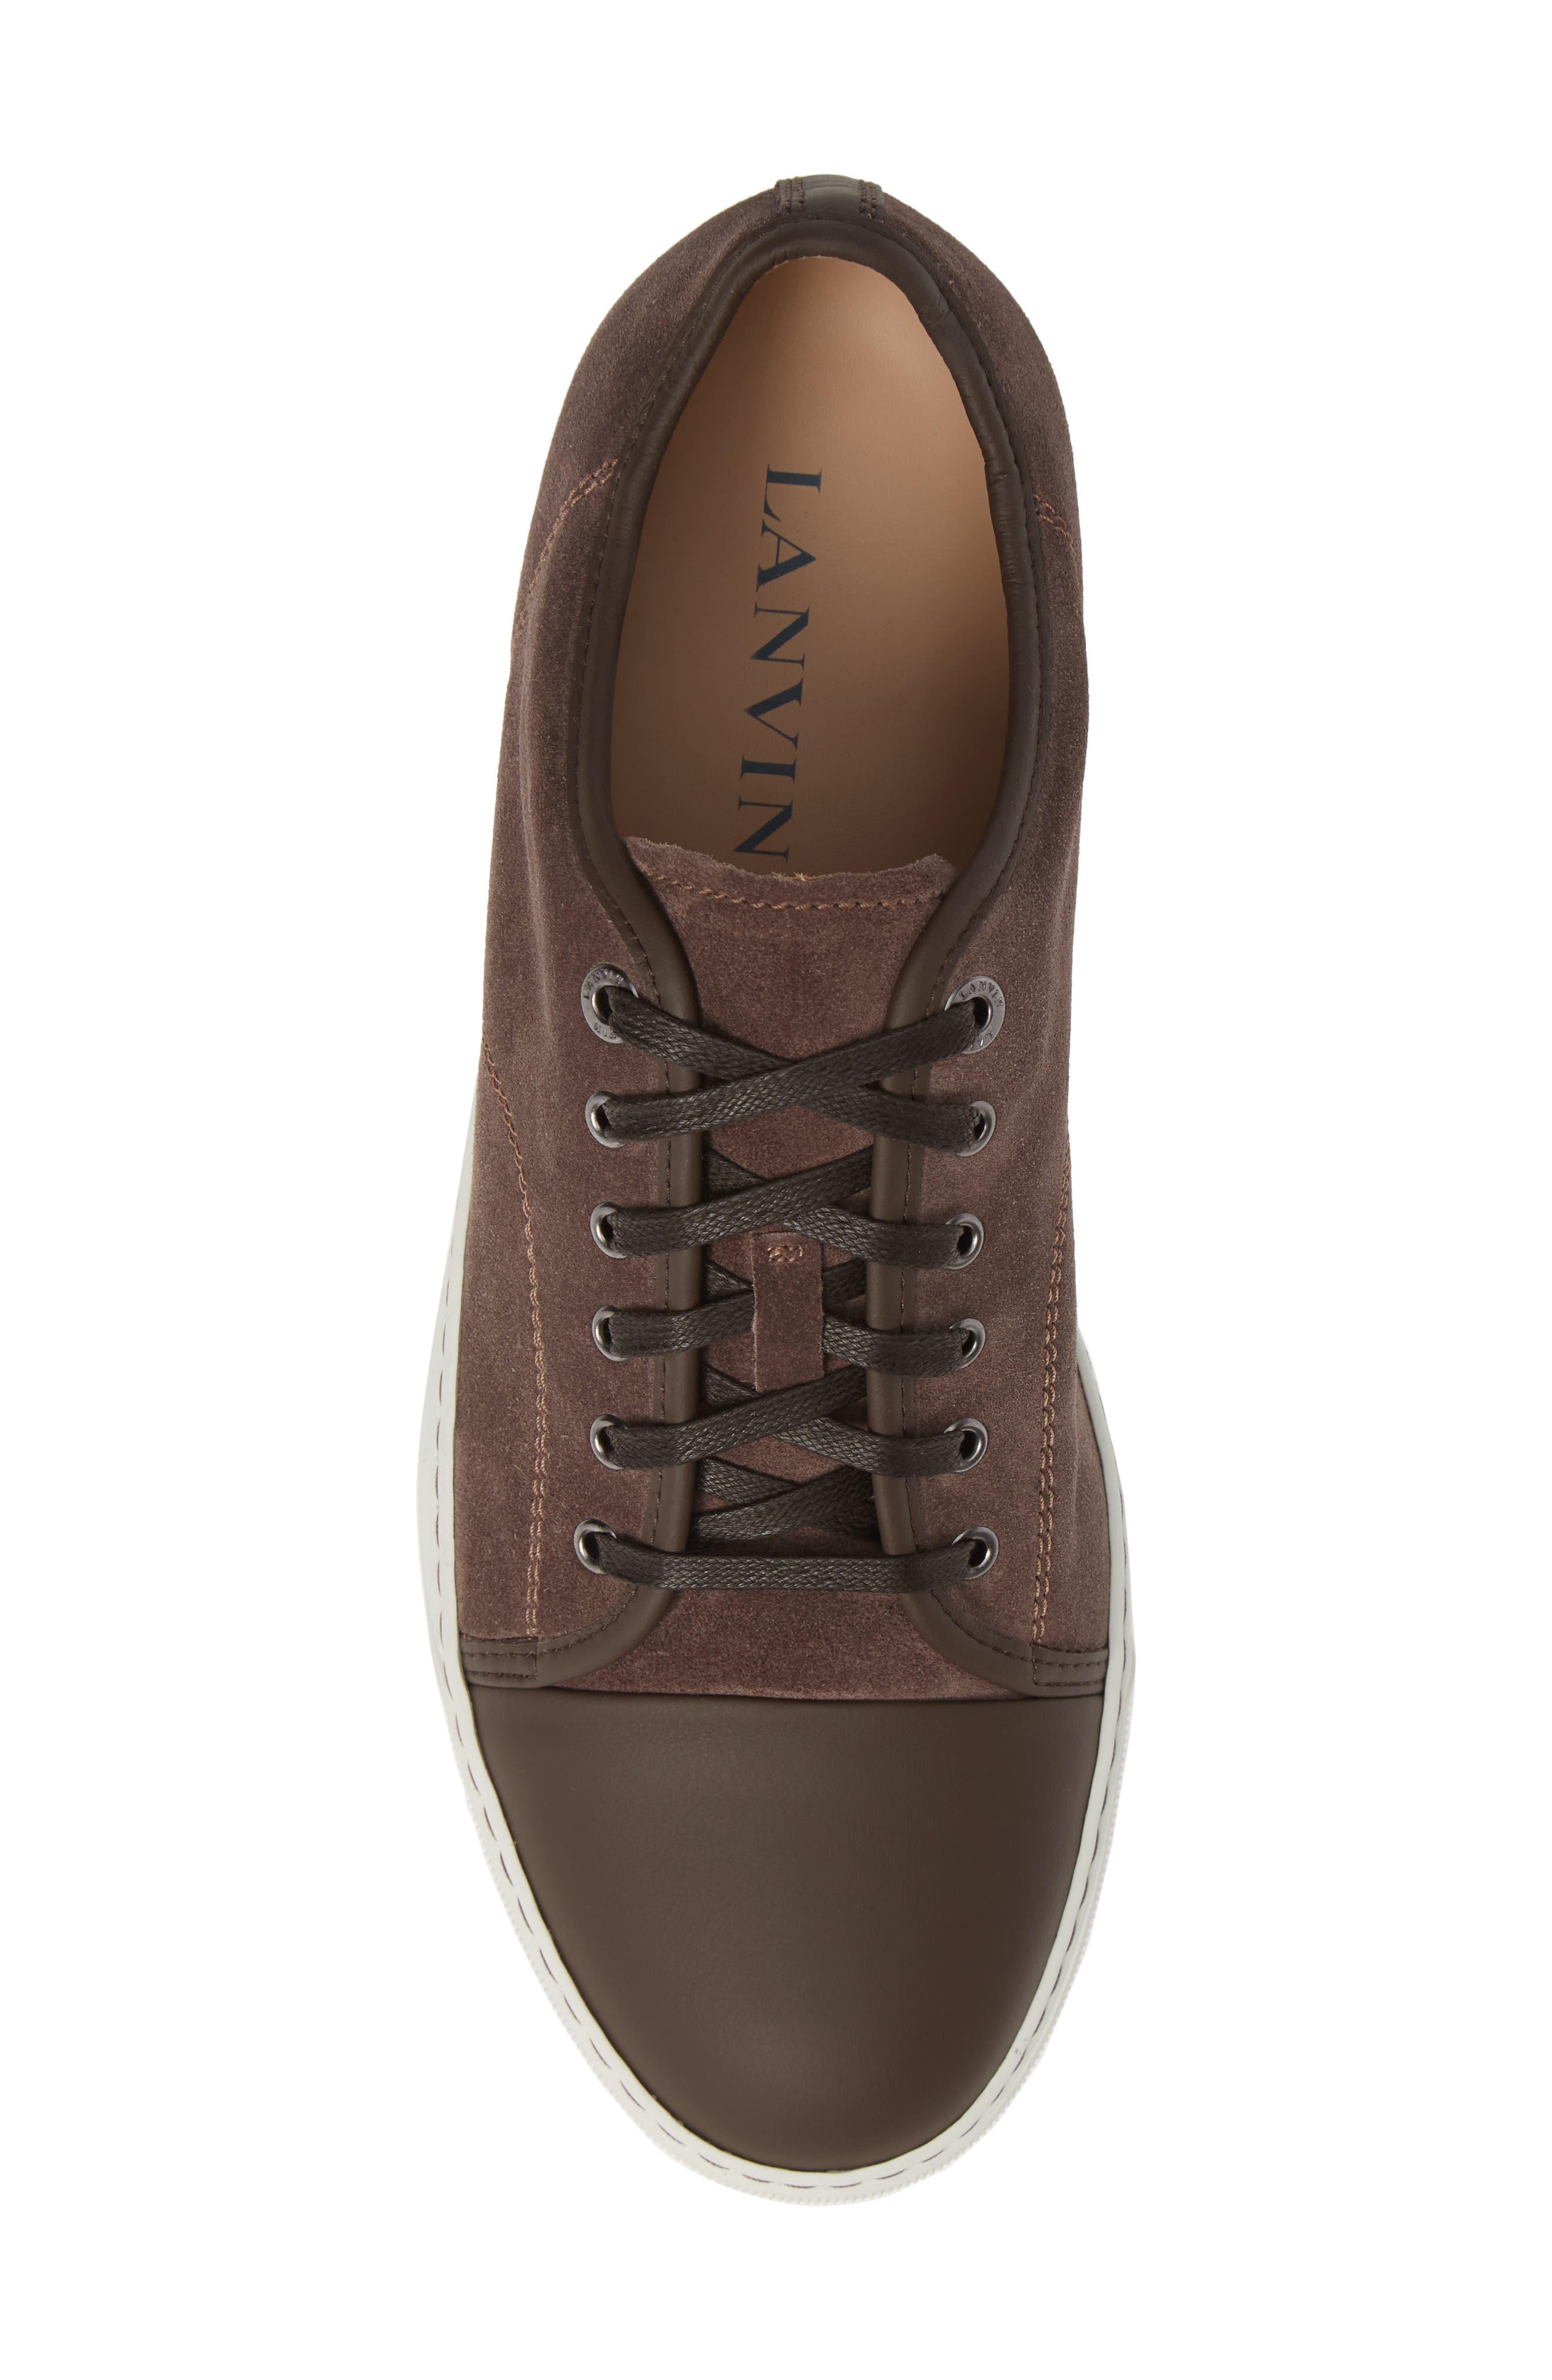 LANVIN, Low Top Sneaker, Alternate thumbnail 5, color, CLAY